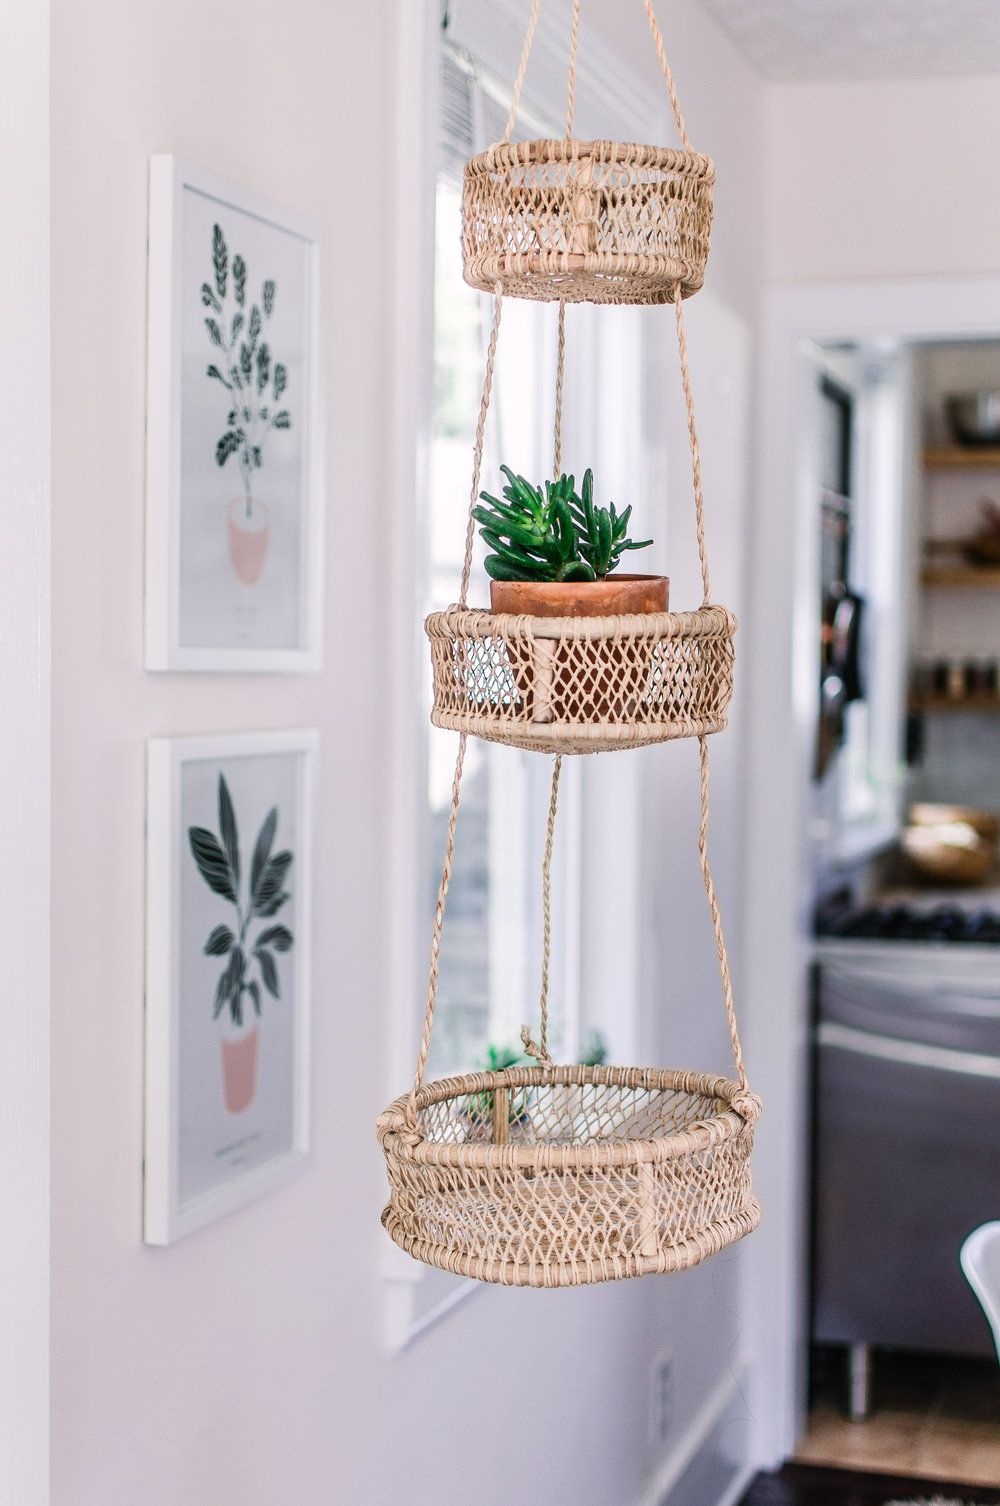 Dsc 0549 Jpg Hanging Fruit Baskets Kitchen Wall Decor Decor